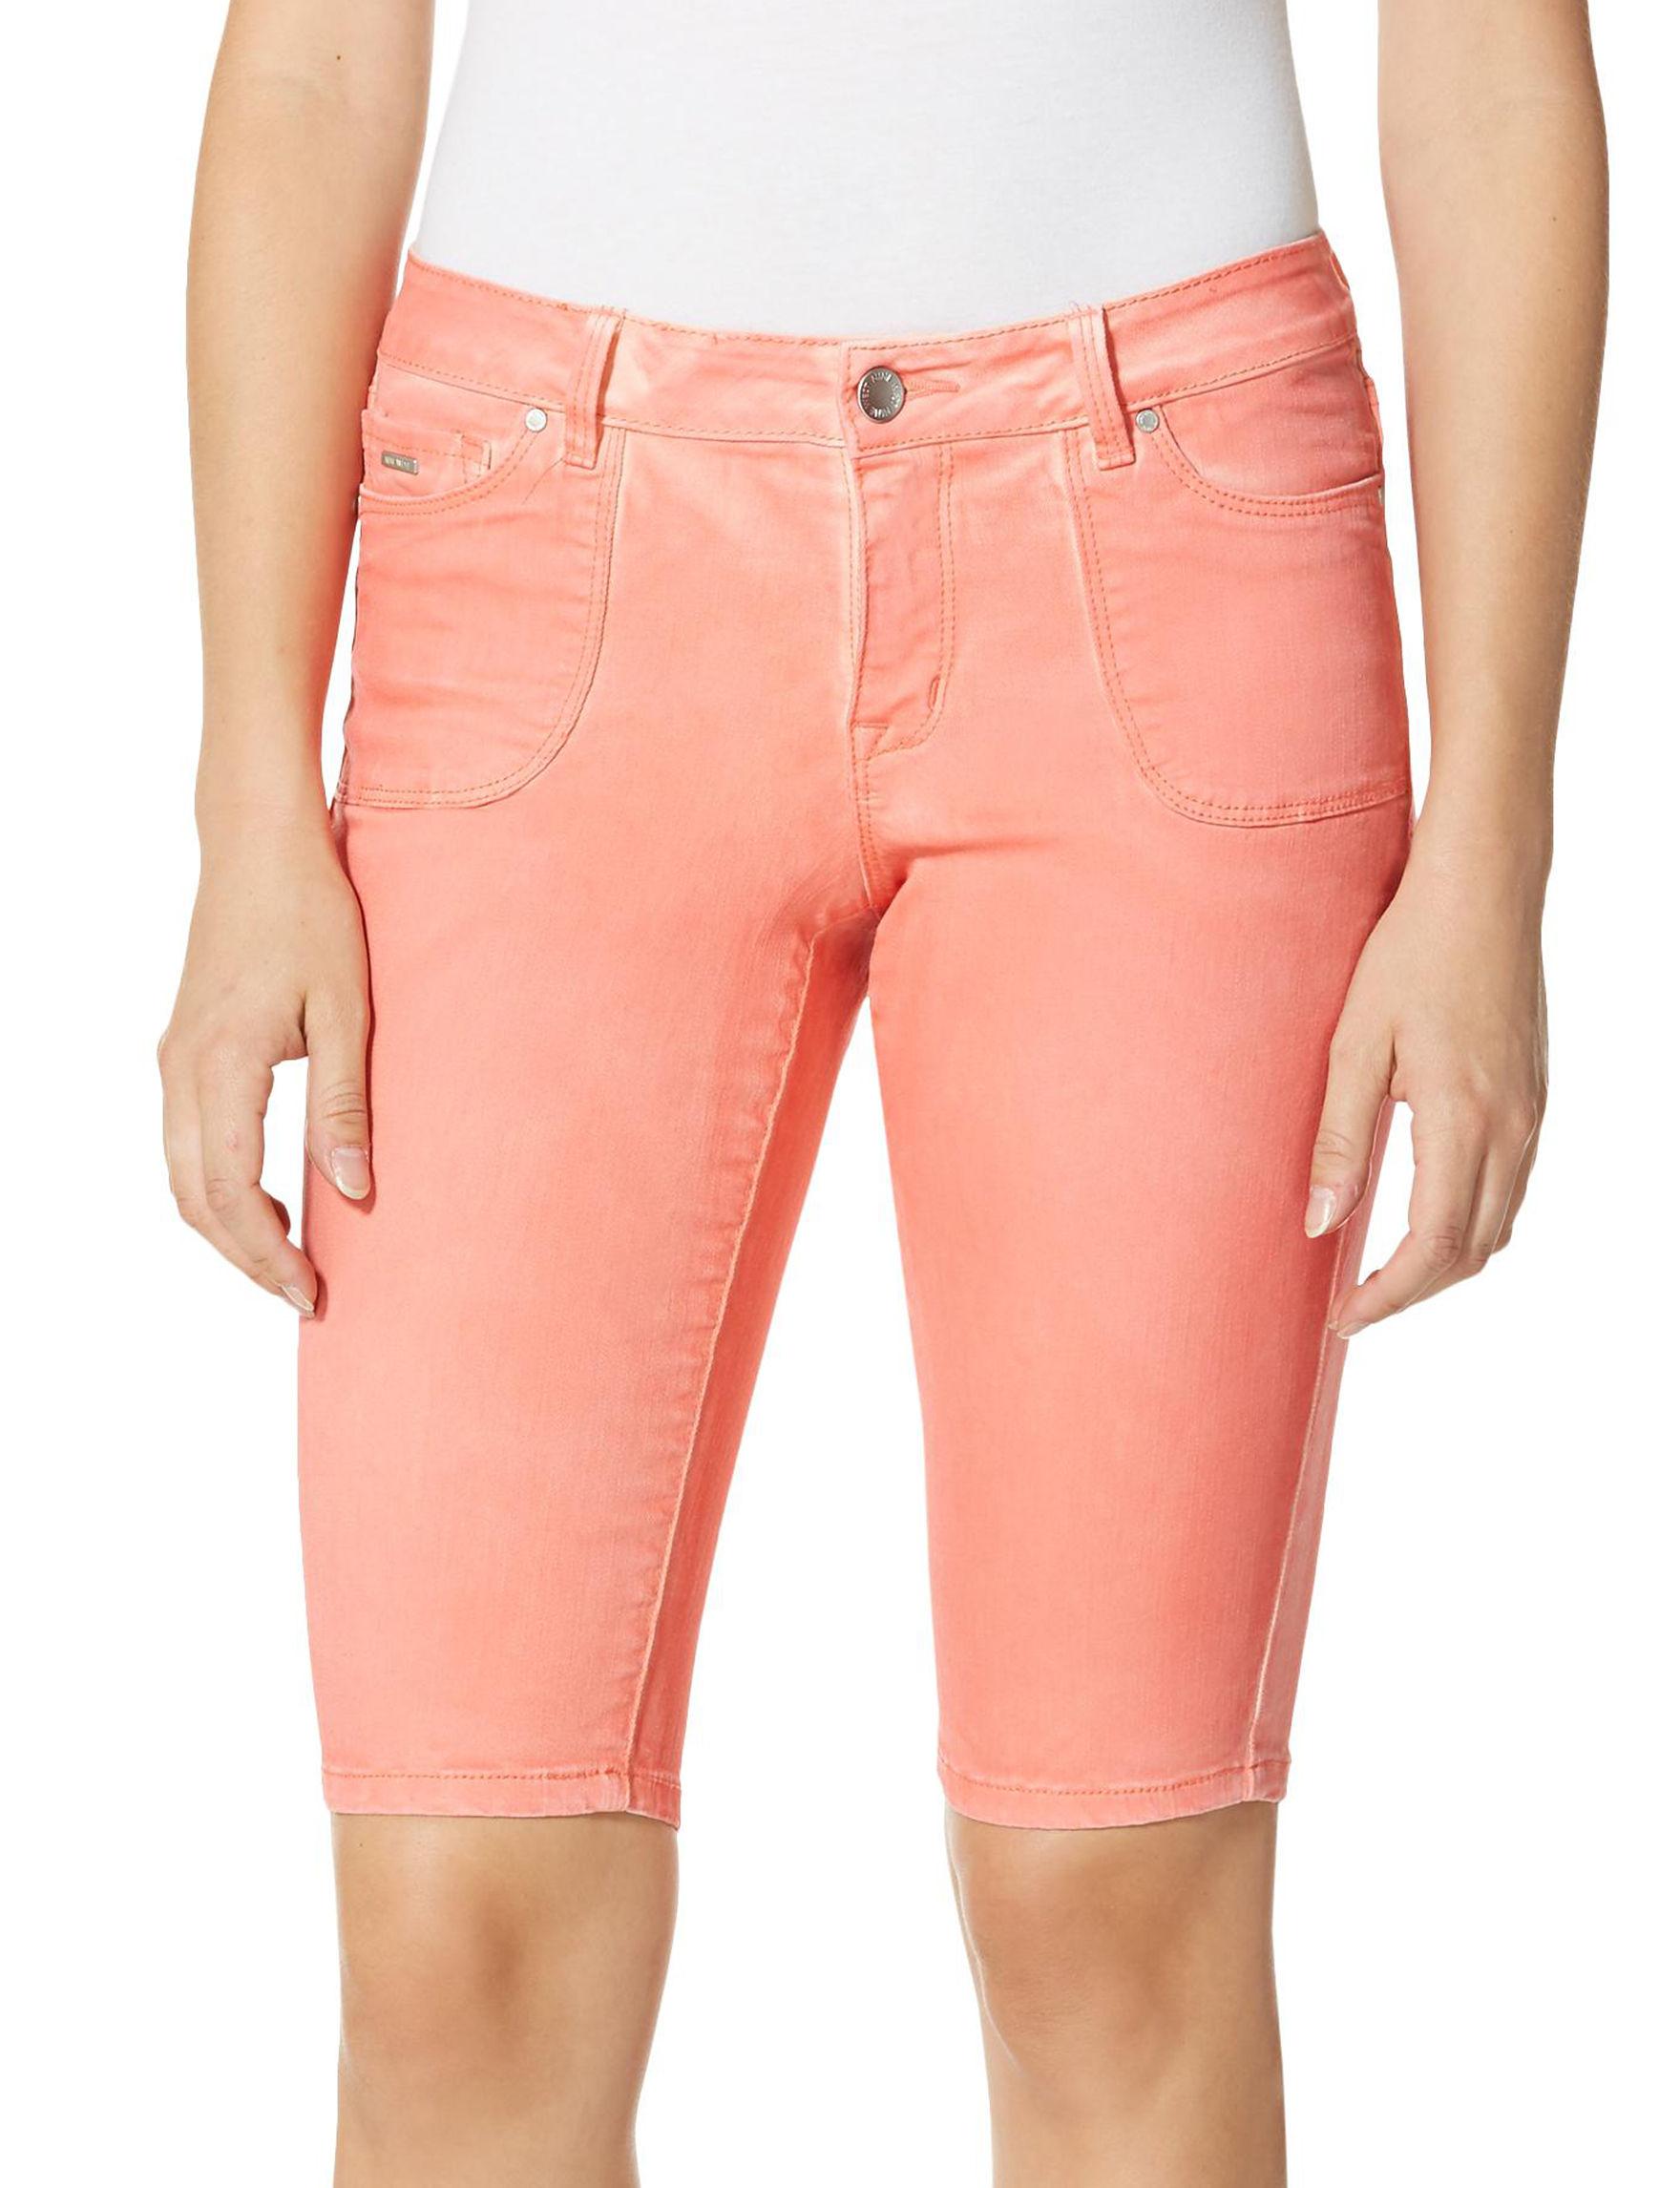 Nine West Jeans Orange Denim Shorts